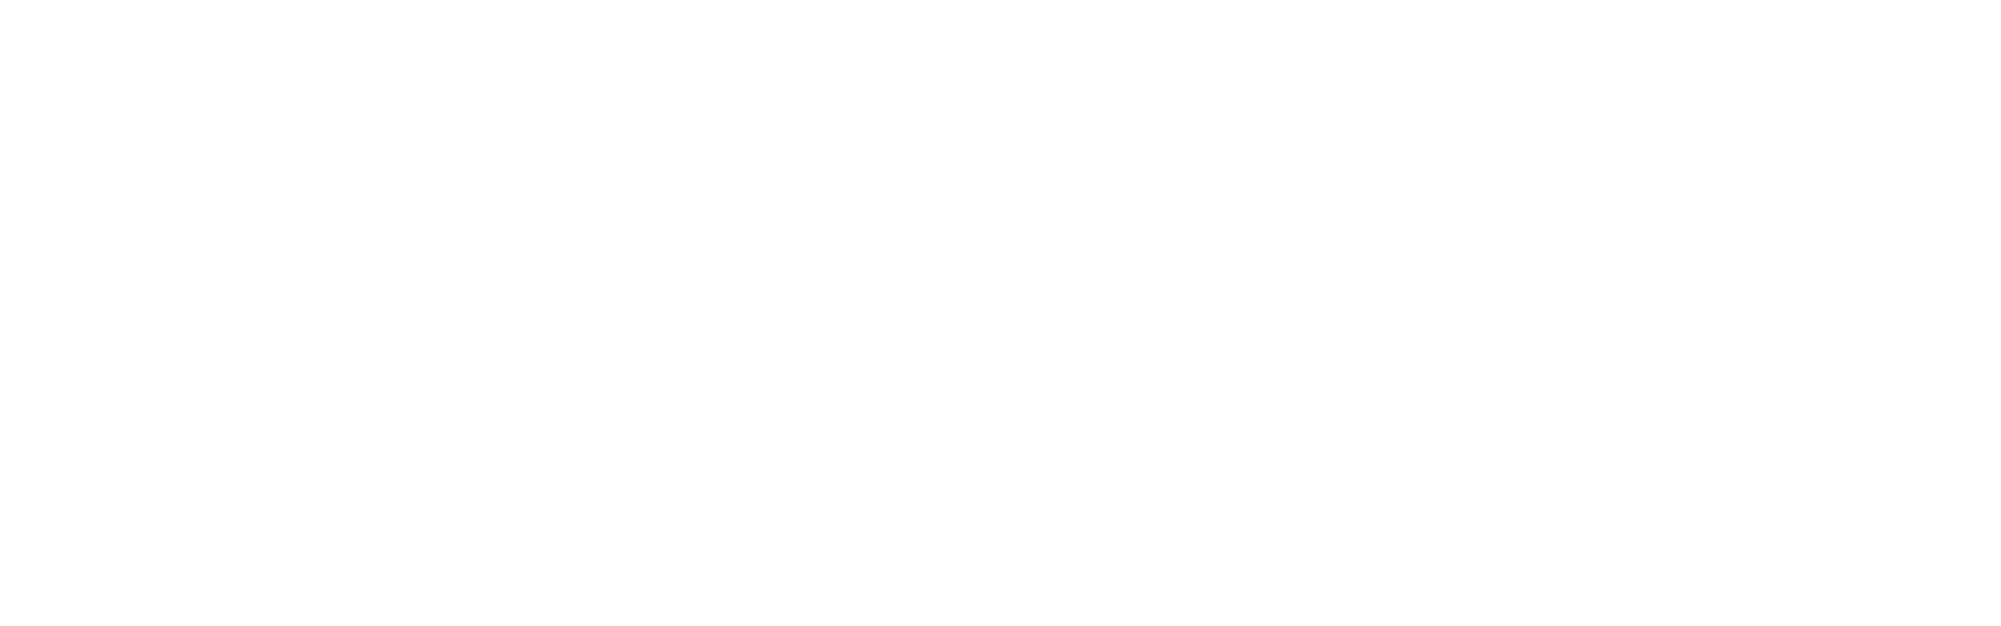 Lending Summit 2018, London